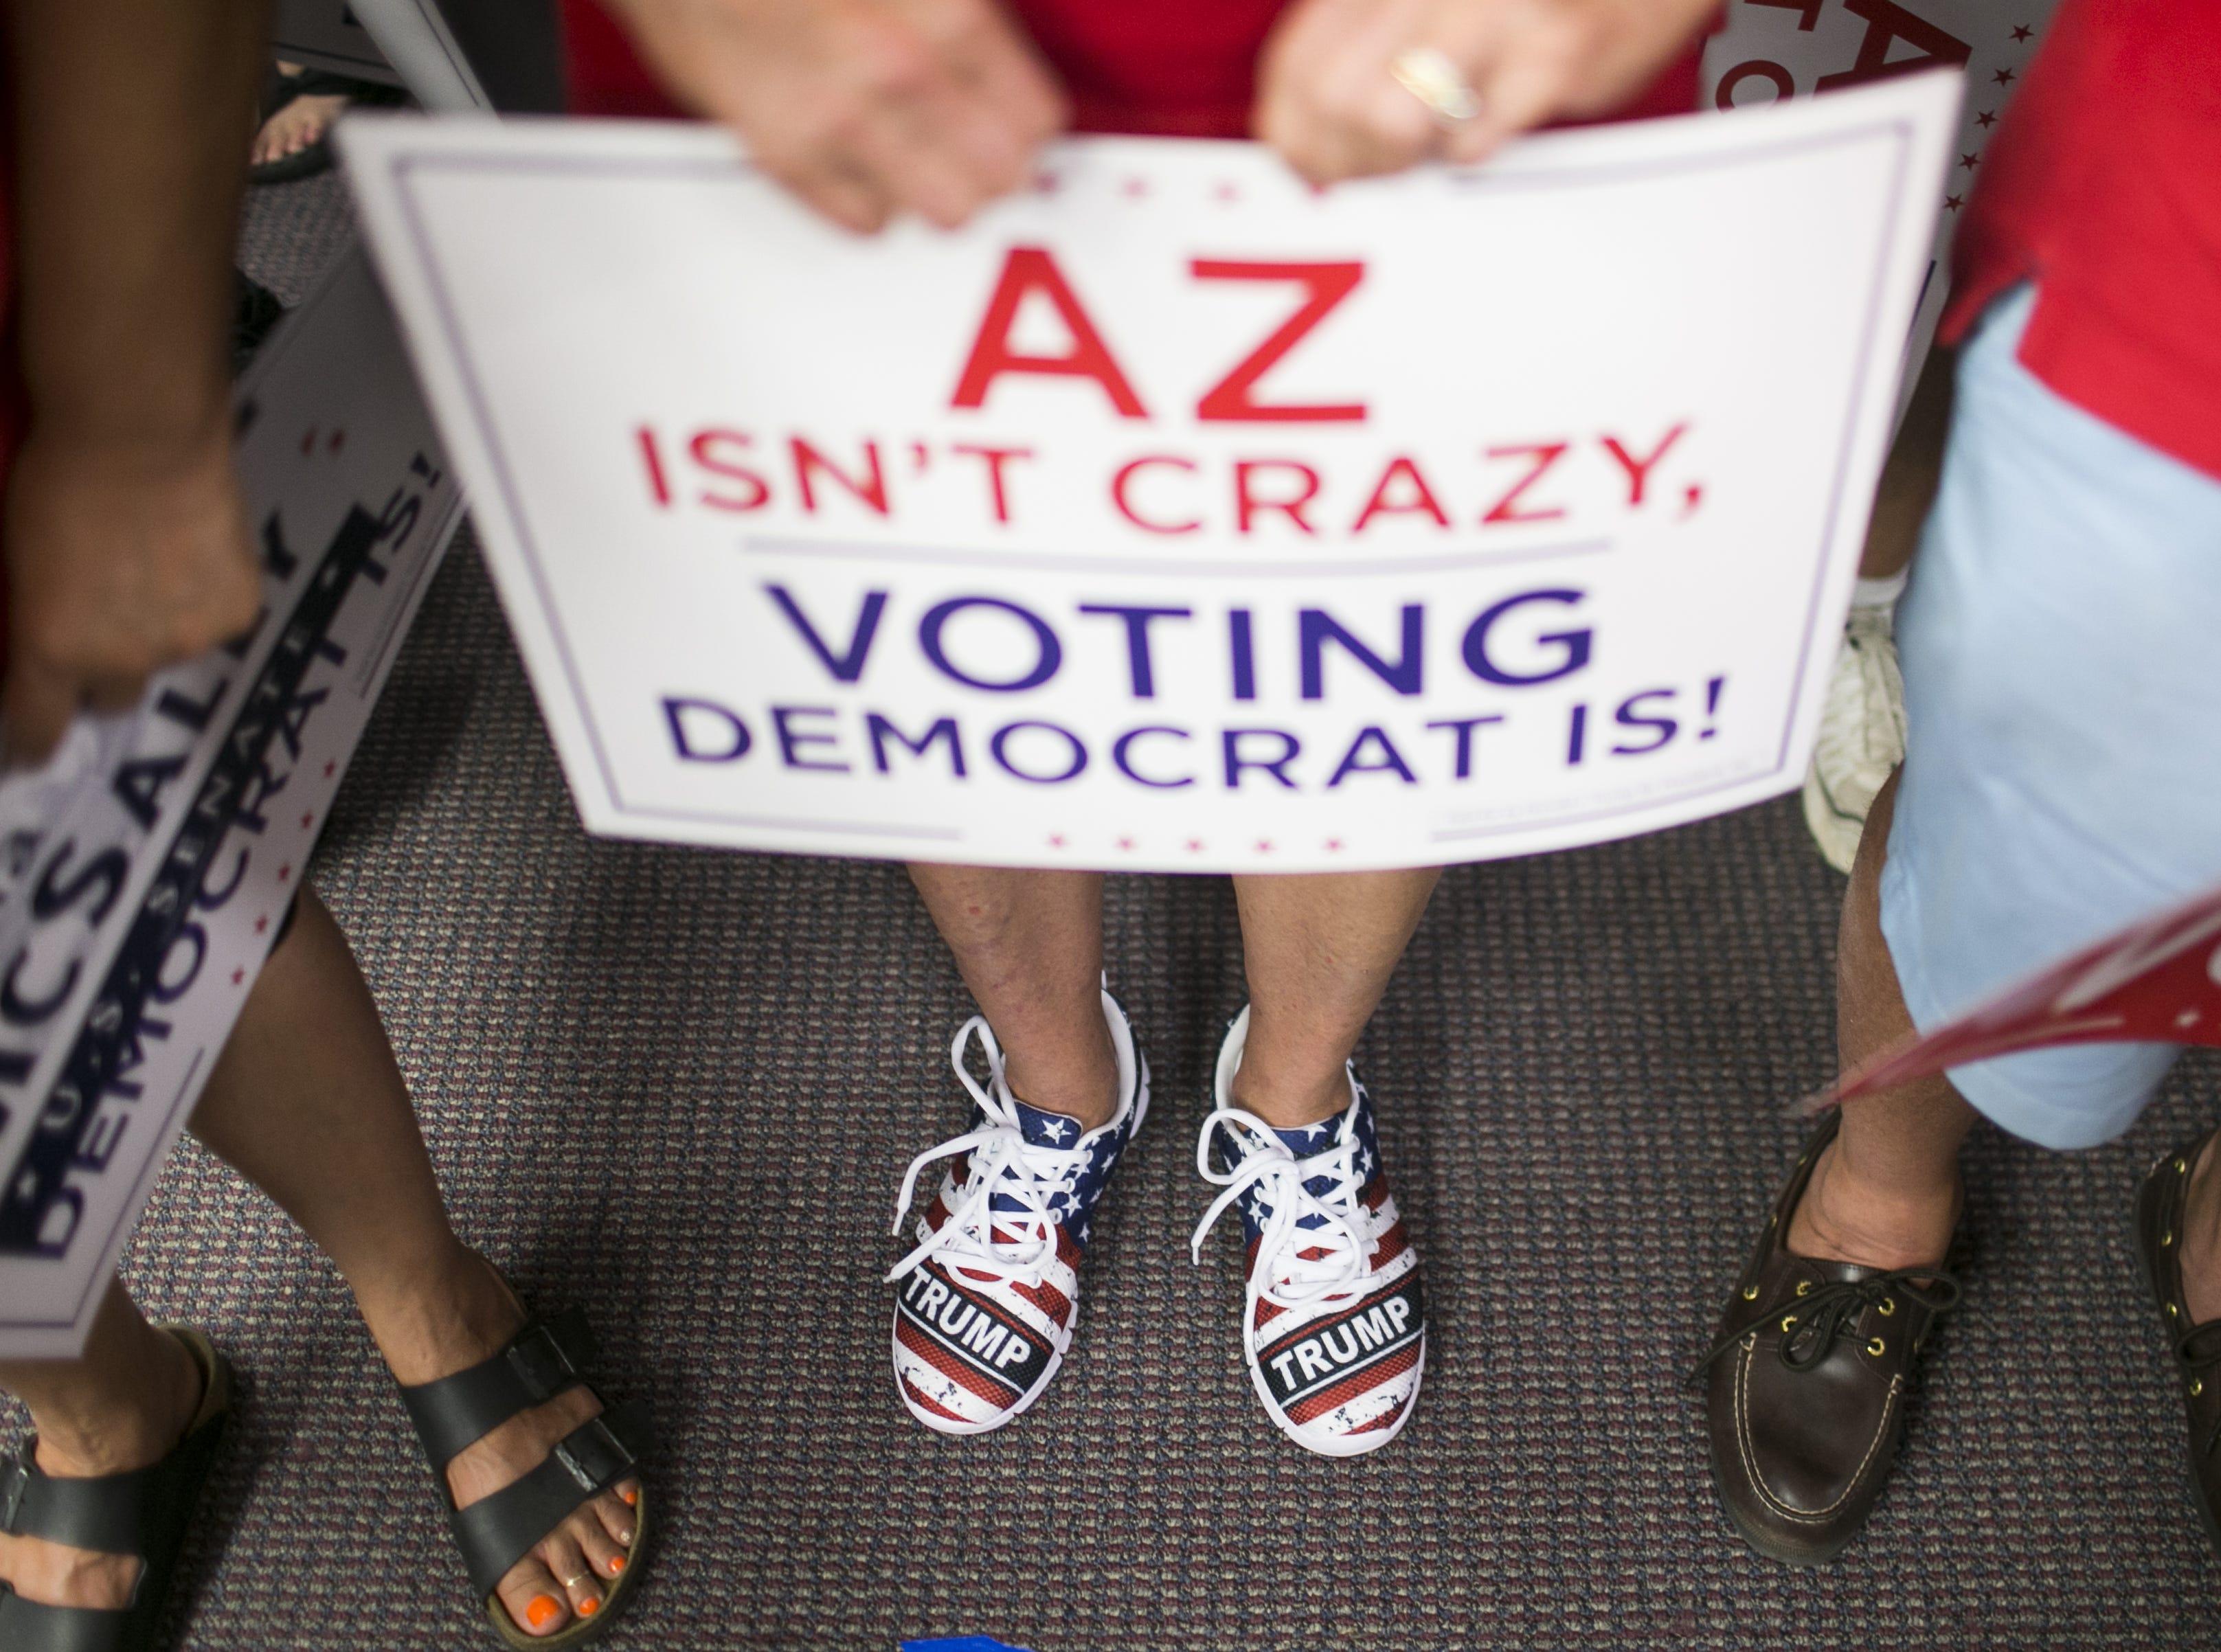 Republican supporters wait to see U.S. Senate candidate Martha McSally and Sen. Lindsey Graham, R-S.C. speak at the Arizona GOP headquarters in Phoenix, Ariz. on Oct. 27, 2018.